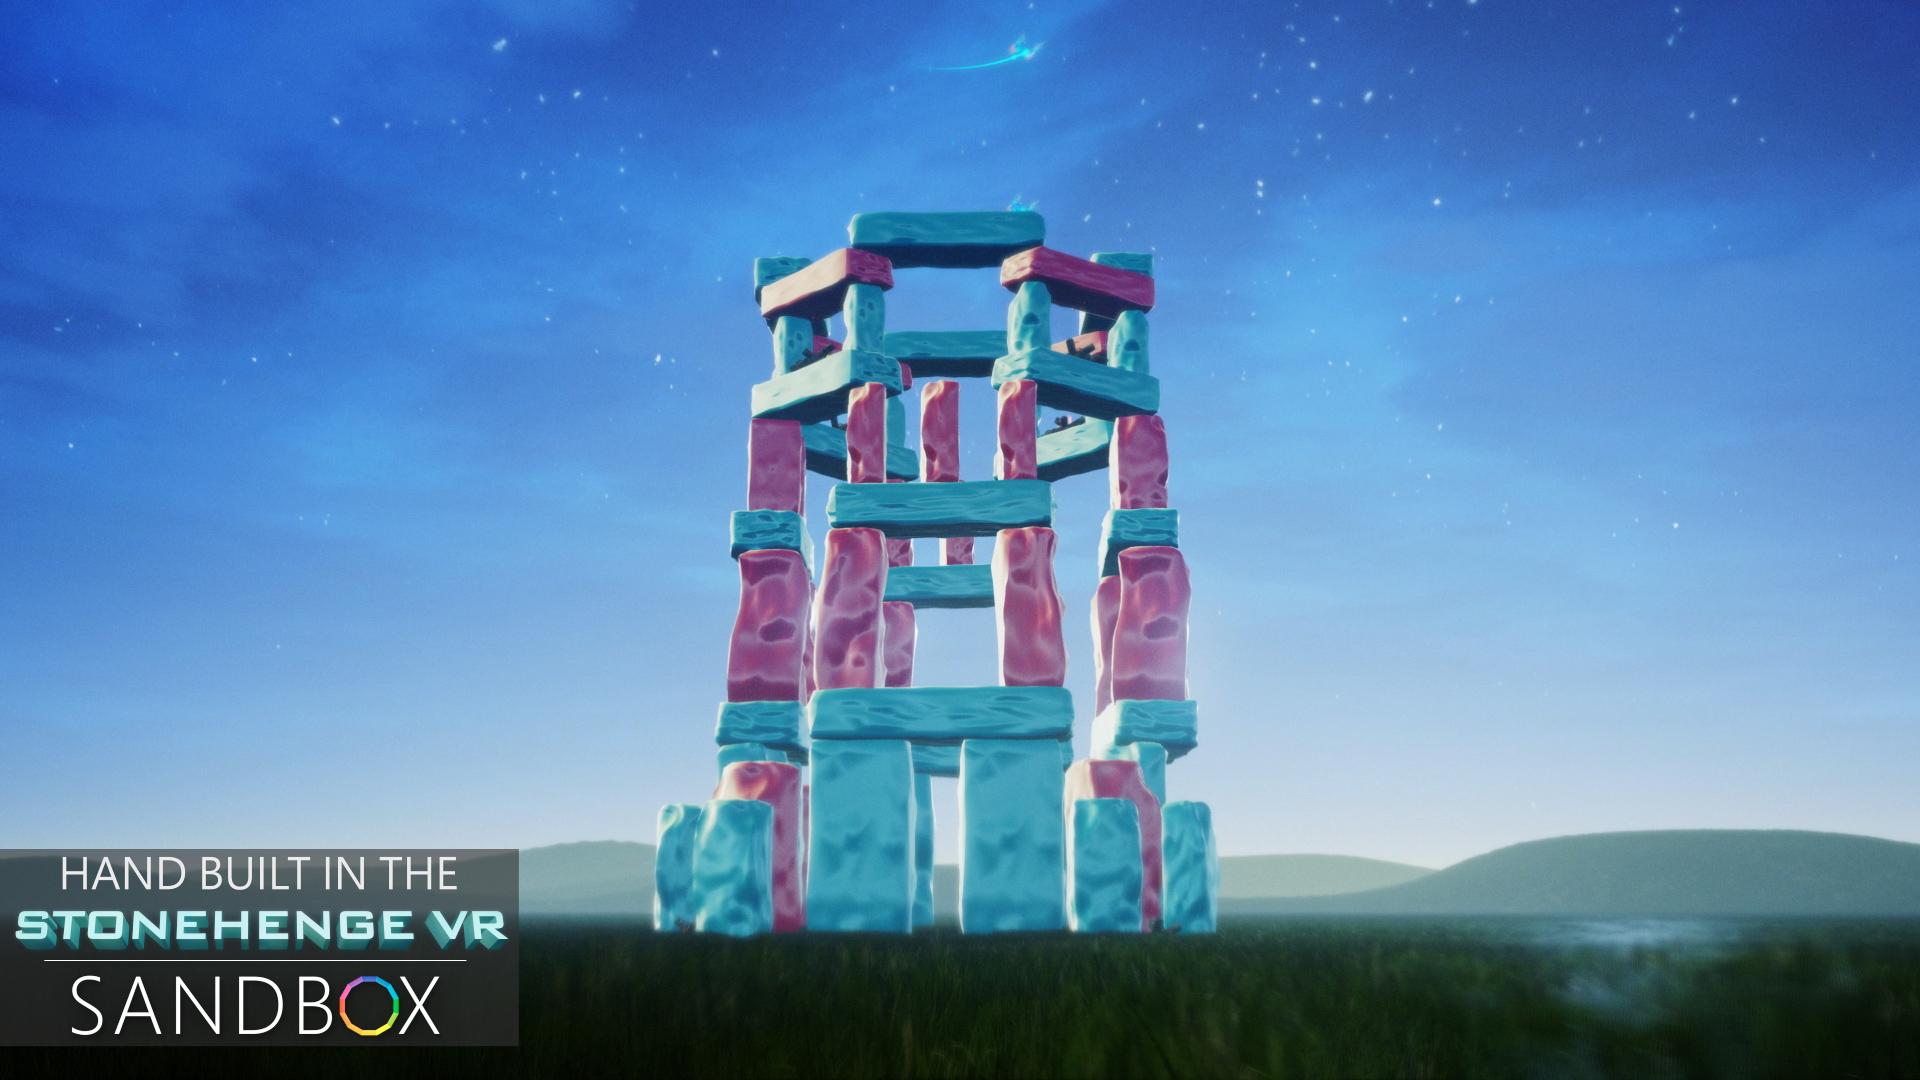 Stonehenge VR SANDBOX_SS_Hand Built Monument_02.jpg